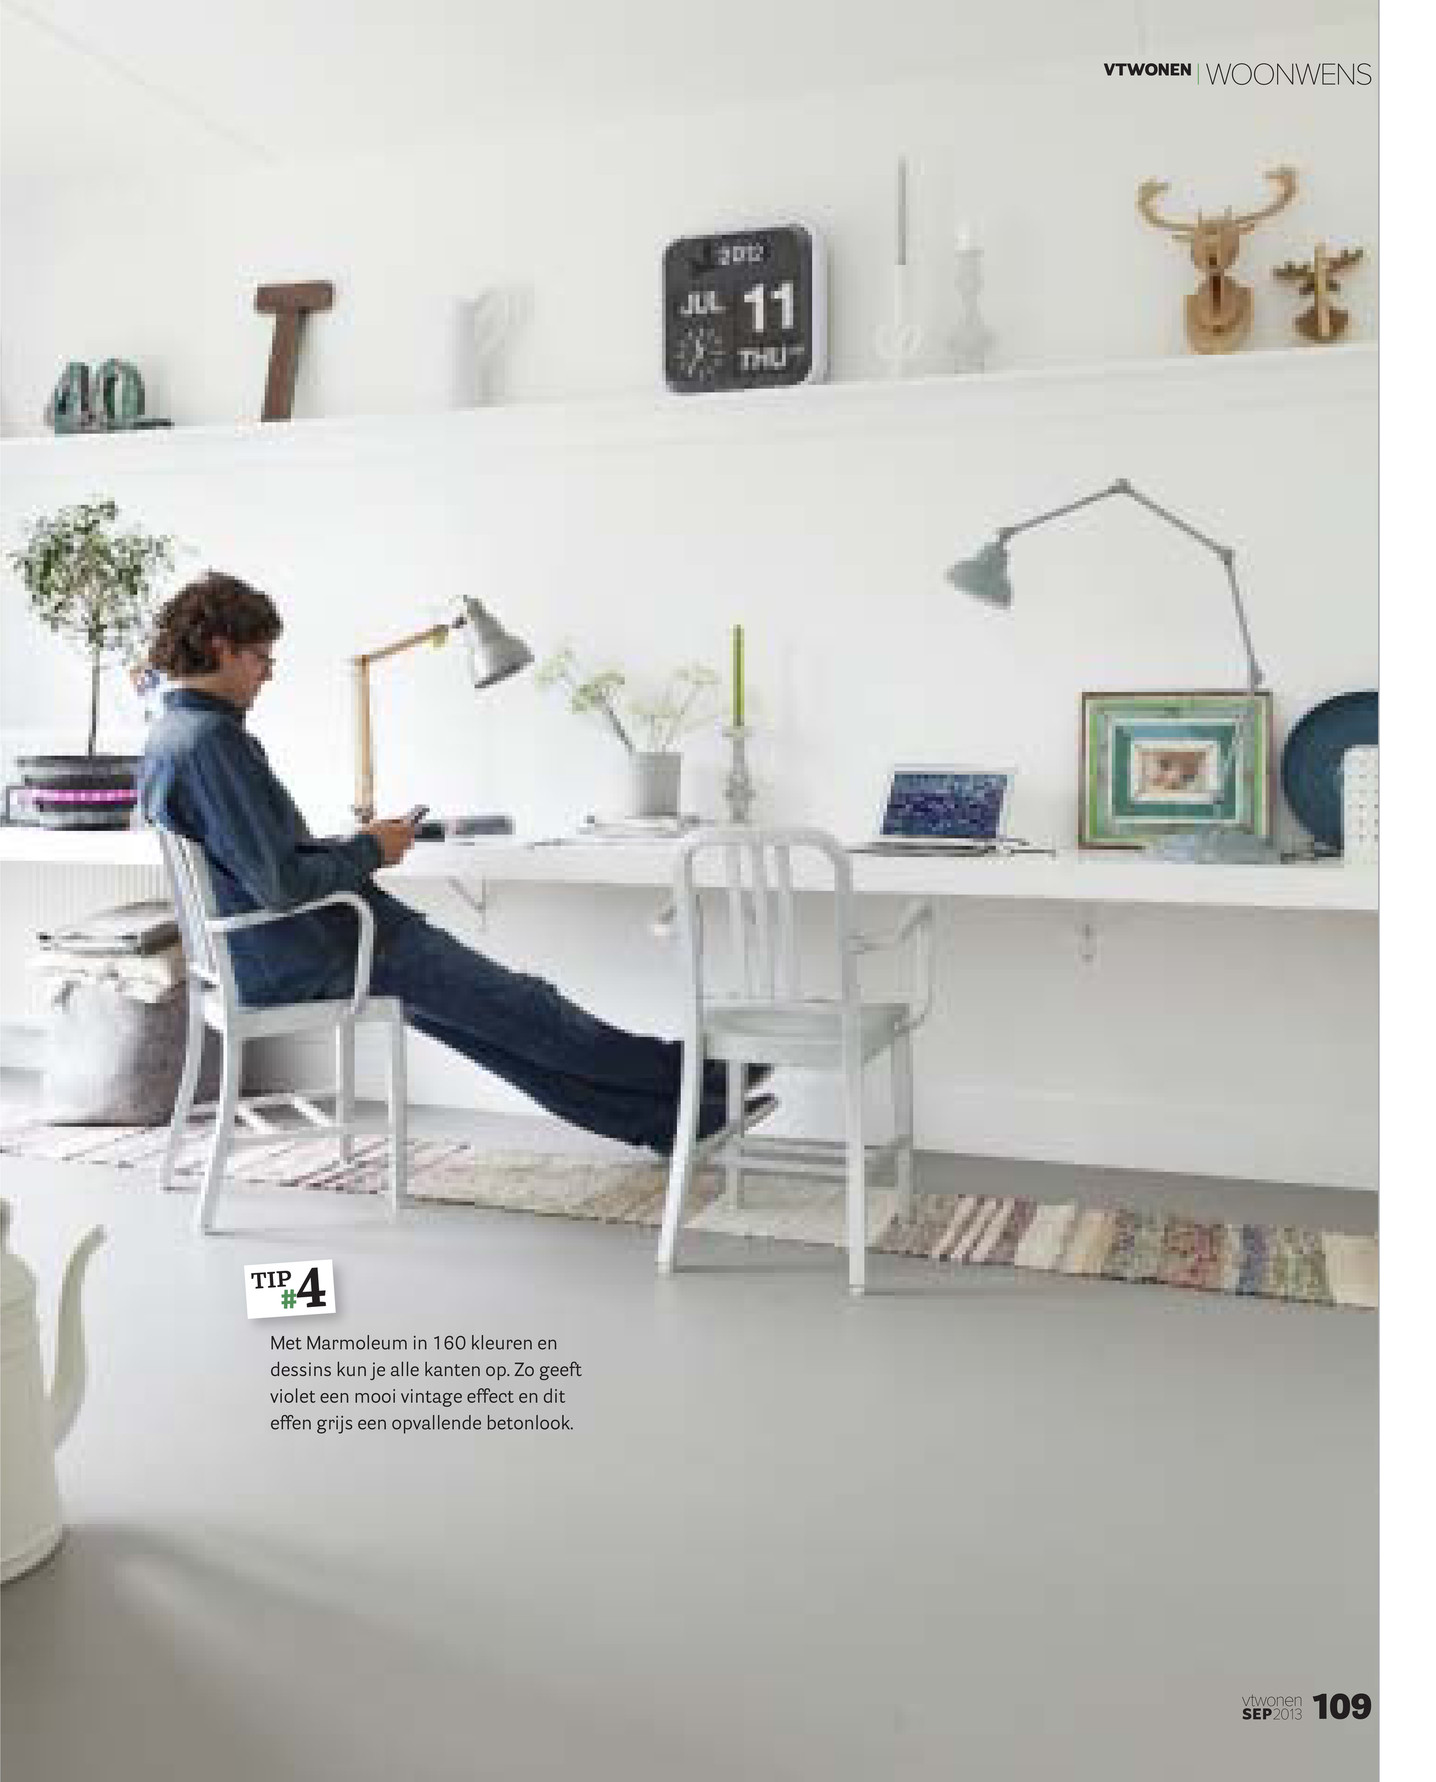 Forbo Flooring NL - VT wonen Woonwens 2013 - Pagina 4-5